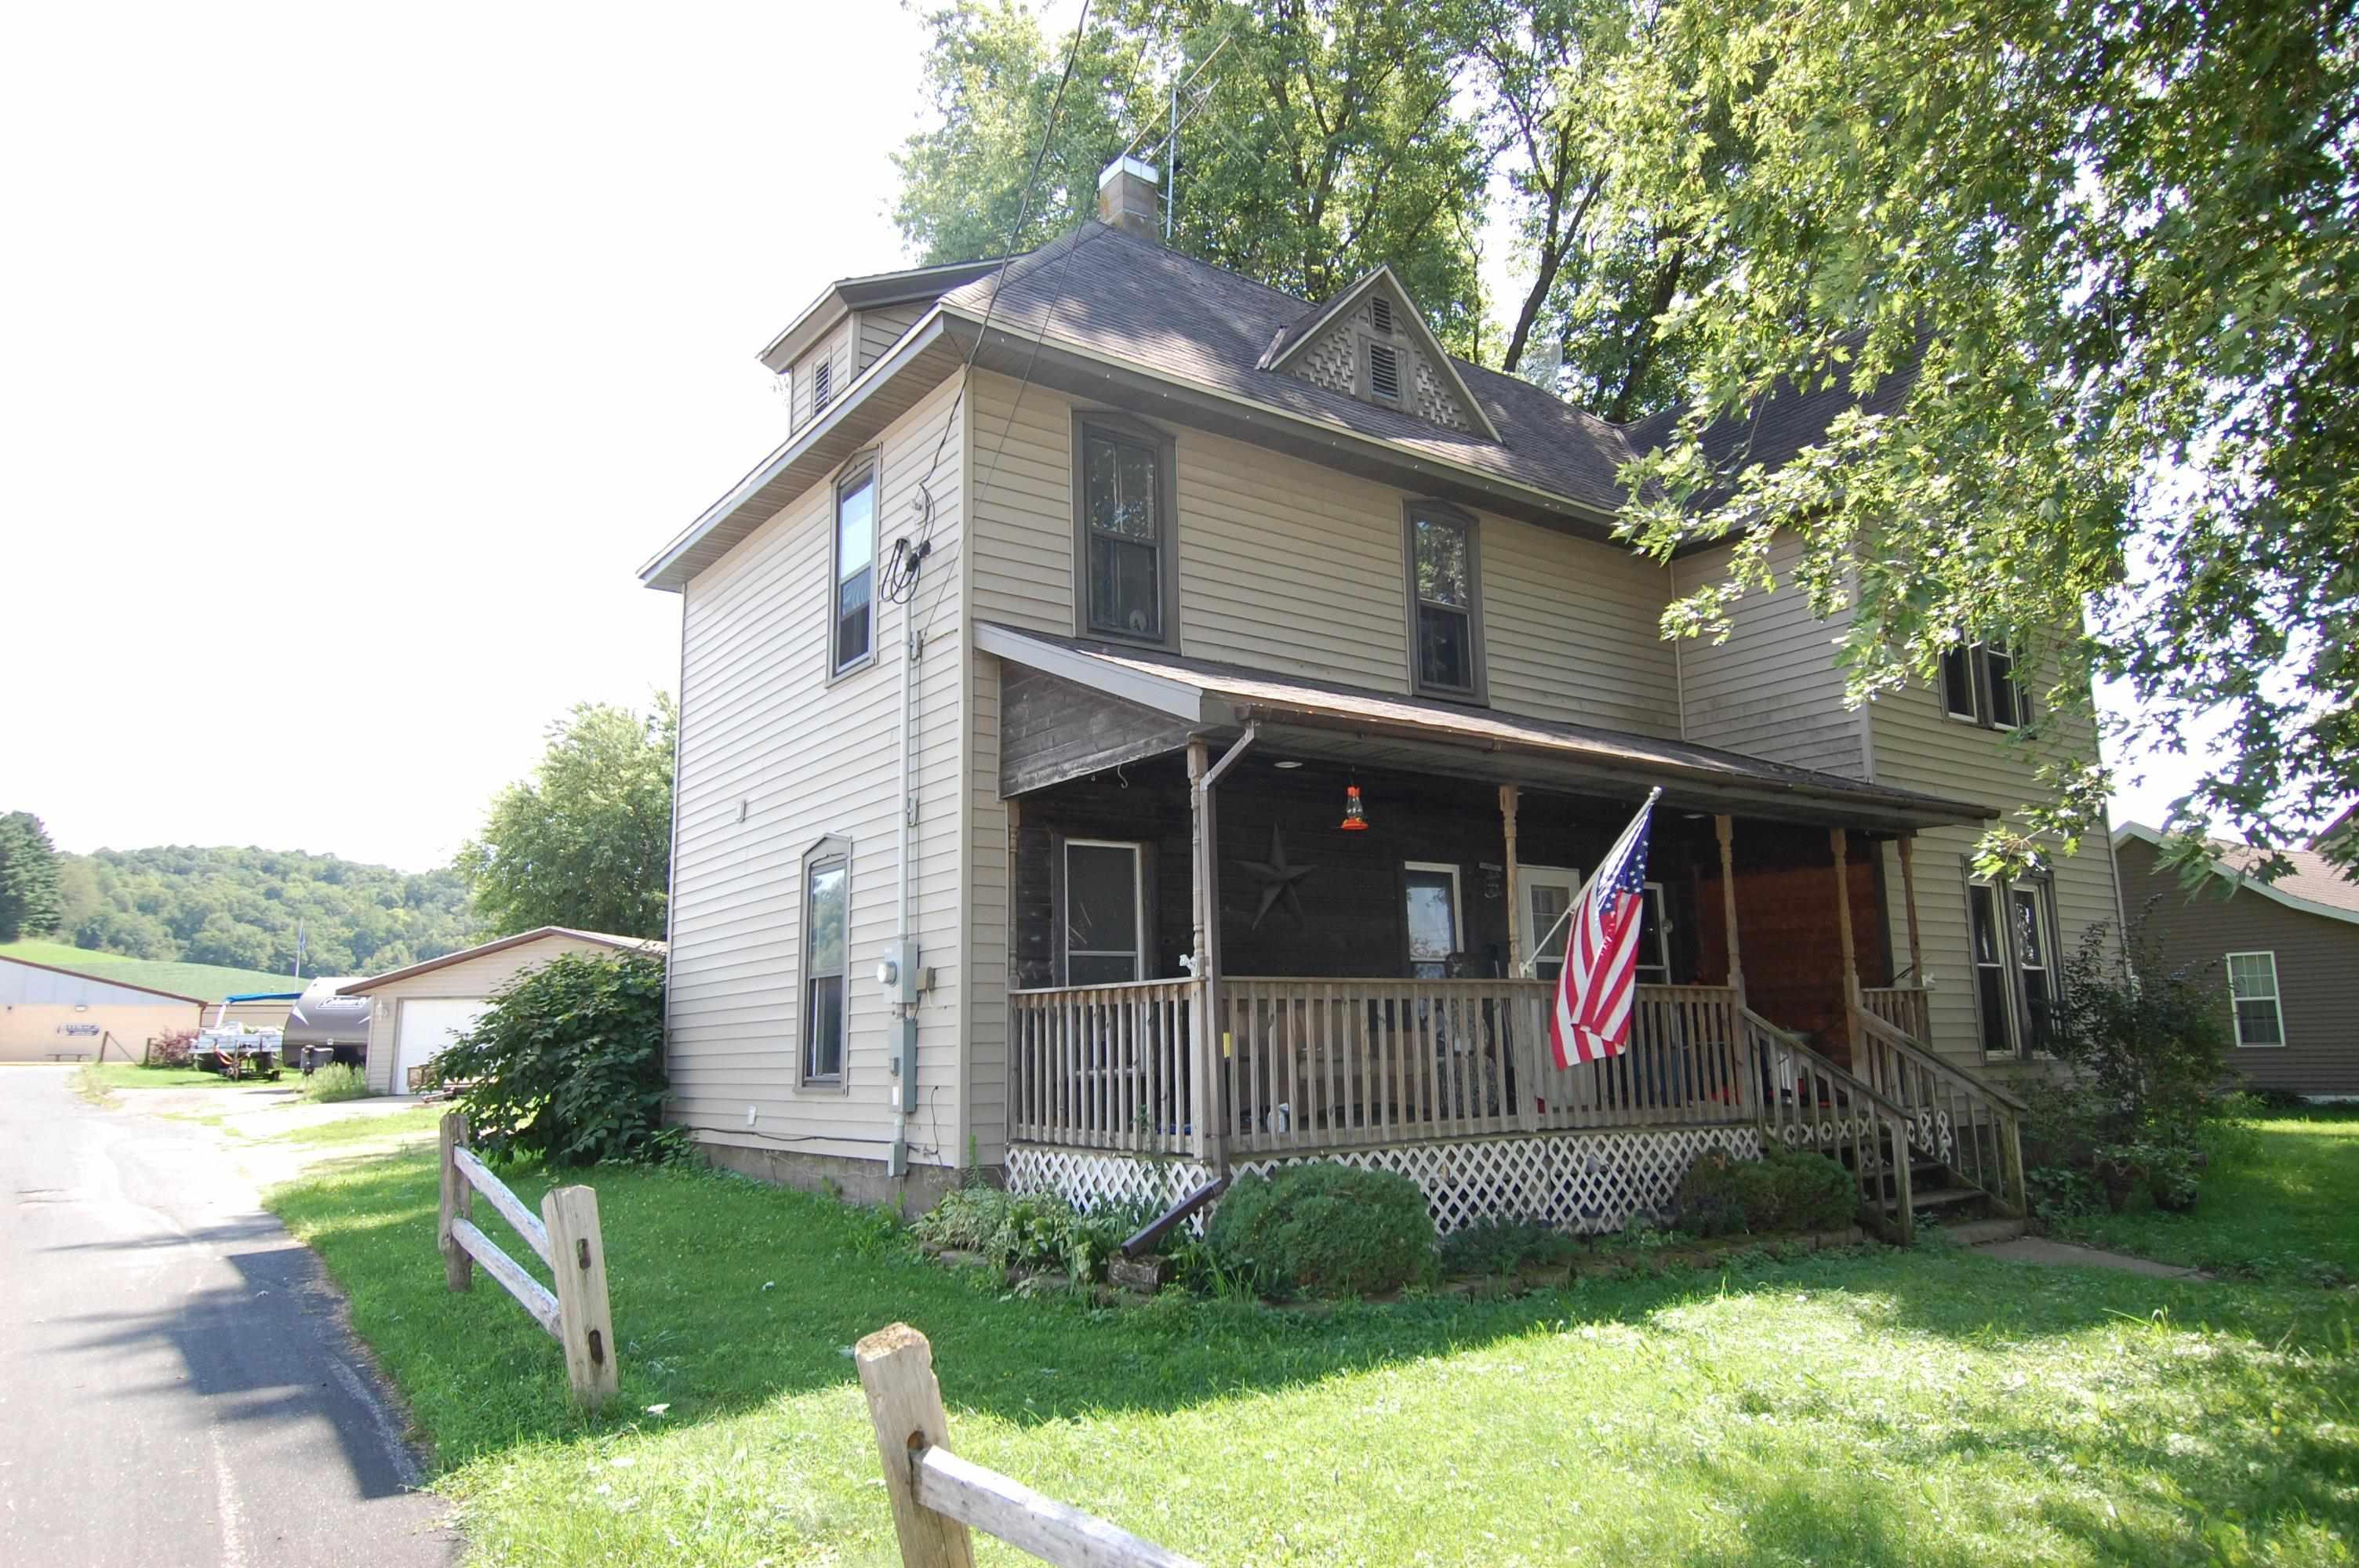 24737 Hwy 58, Ithaca, Wisconsin 53581, 5 Bedrooms Bedrooms, ,2 BathroomsBathrooms,Single Family,For Sale,Hwy 58,1918392